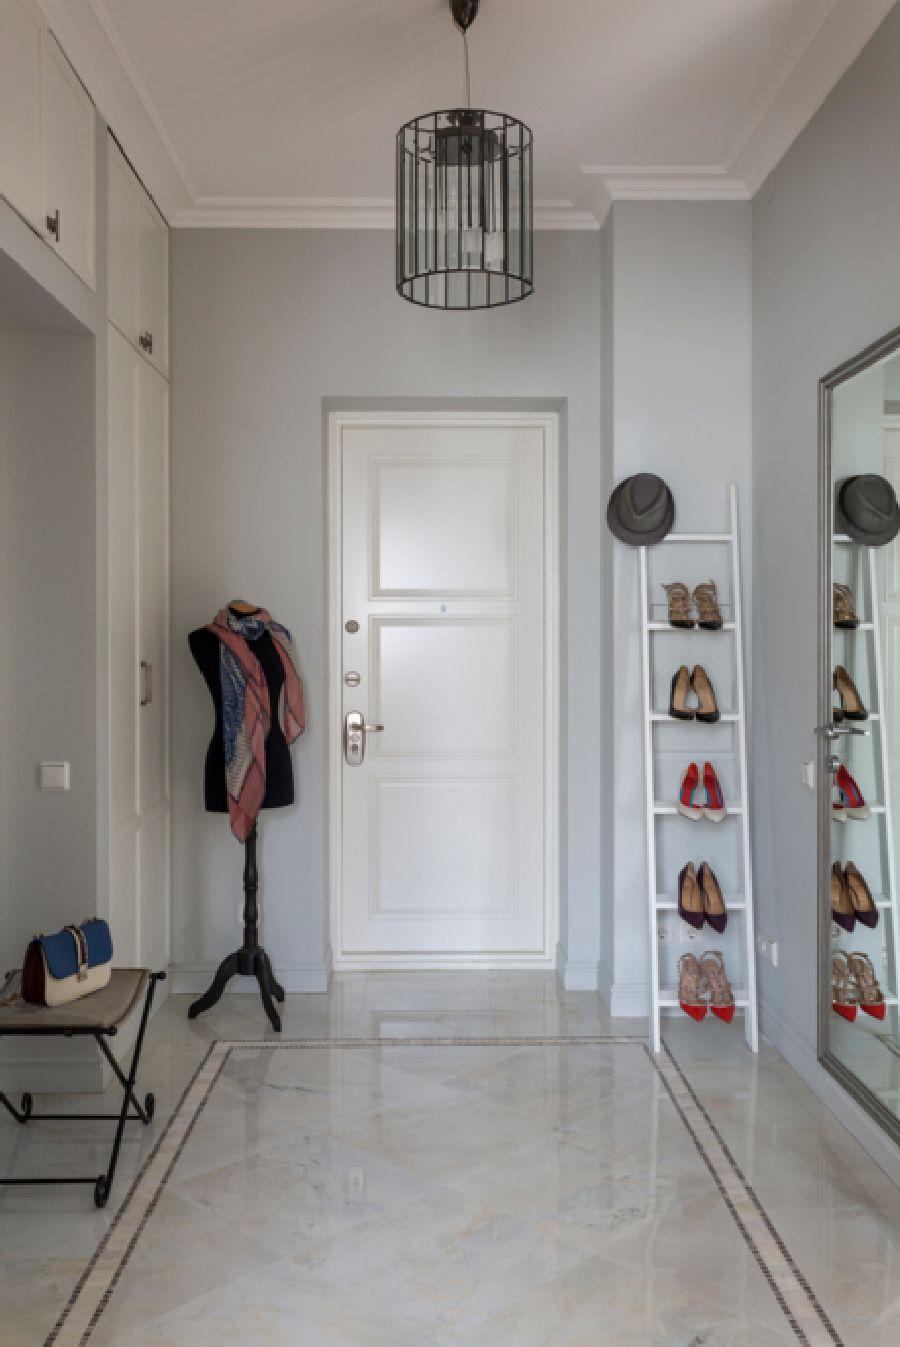 adelaparvu.com despre apartament de 80 mp patrati cu aer rustic elegant, locuinta Rusia, designer Zhenya Zhdanova (15)